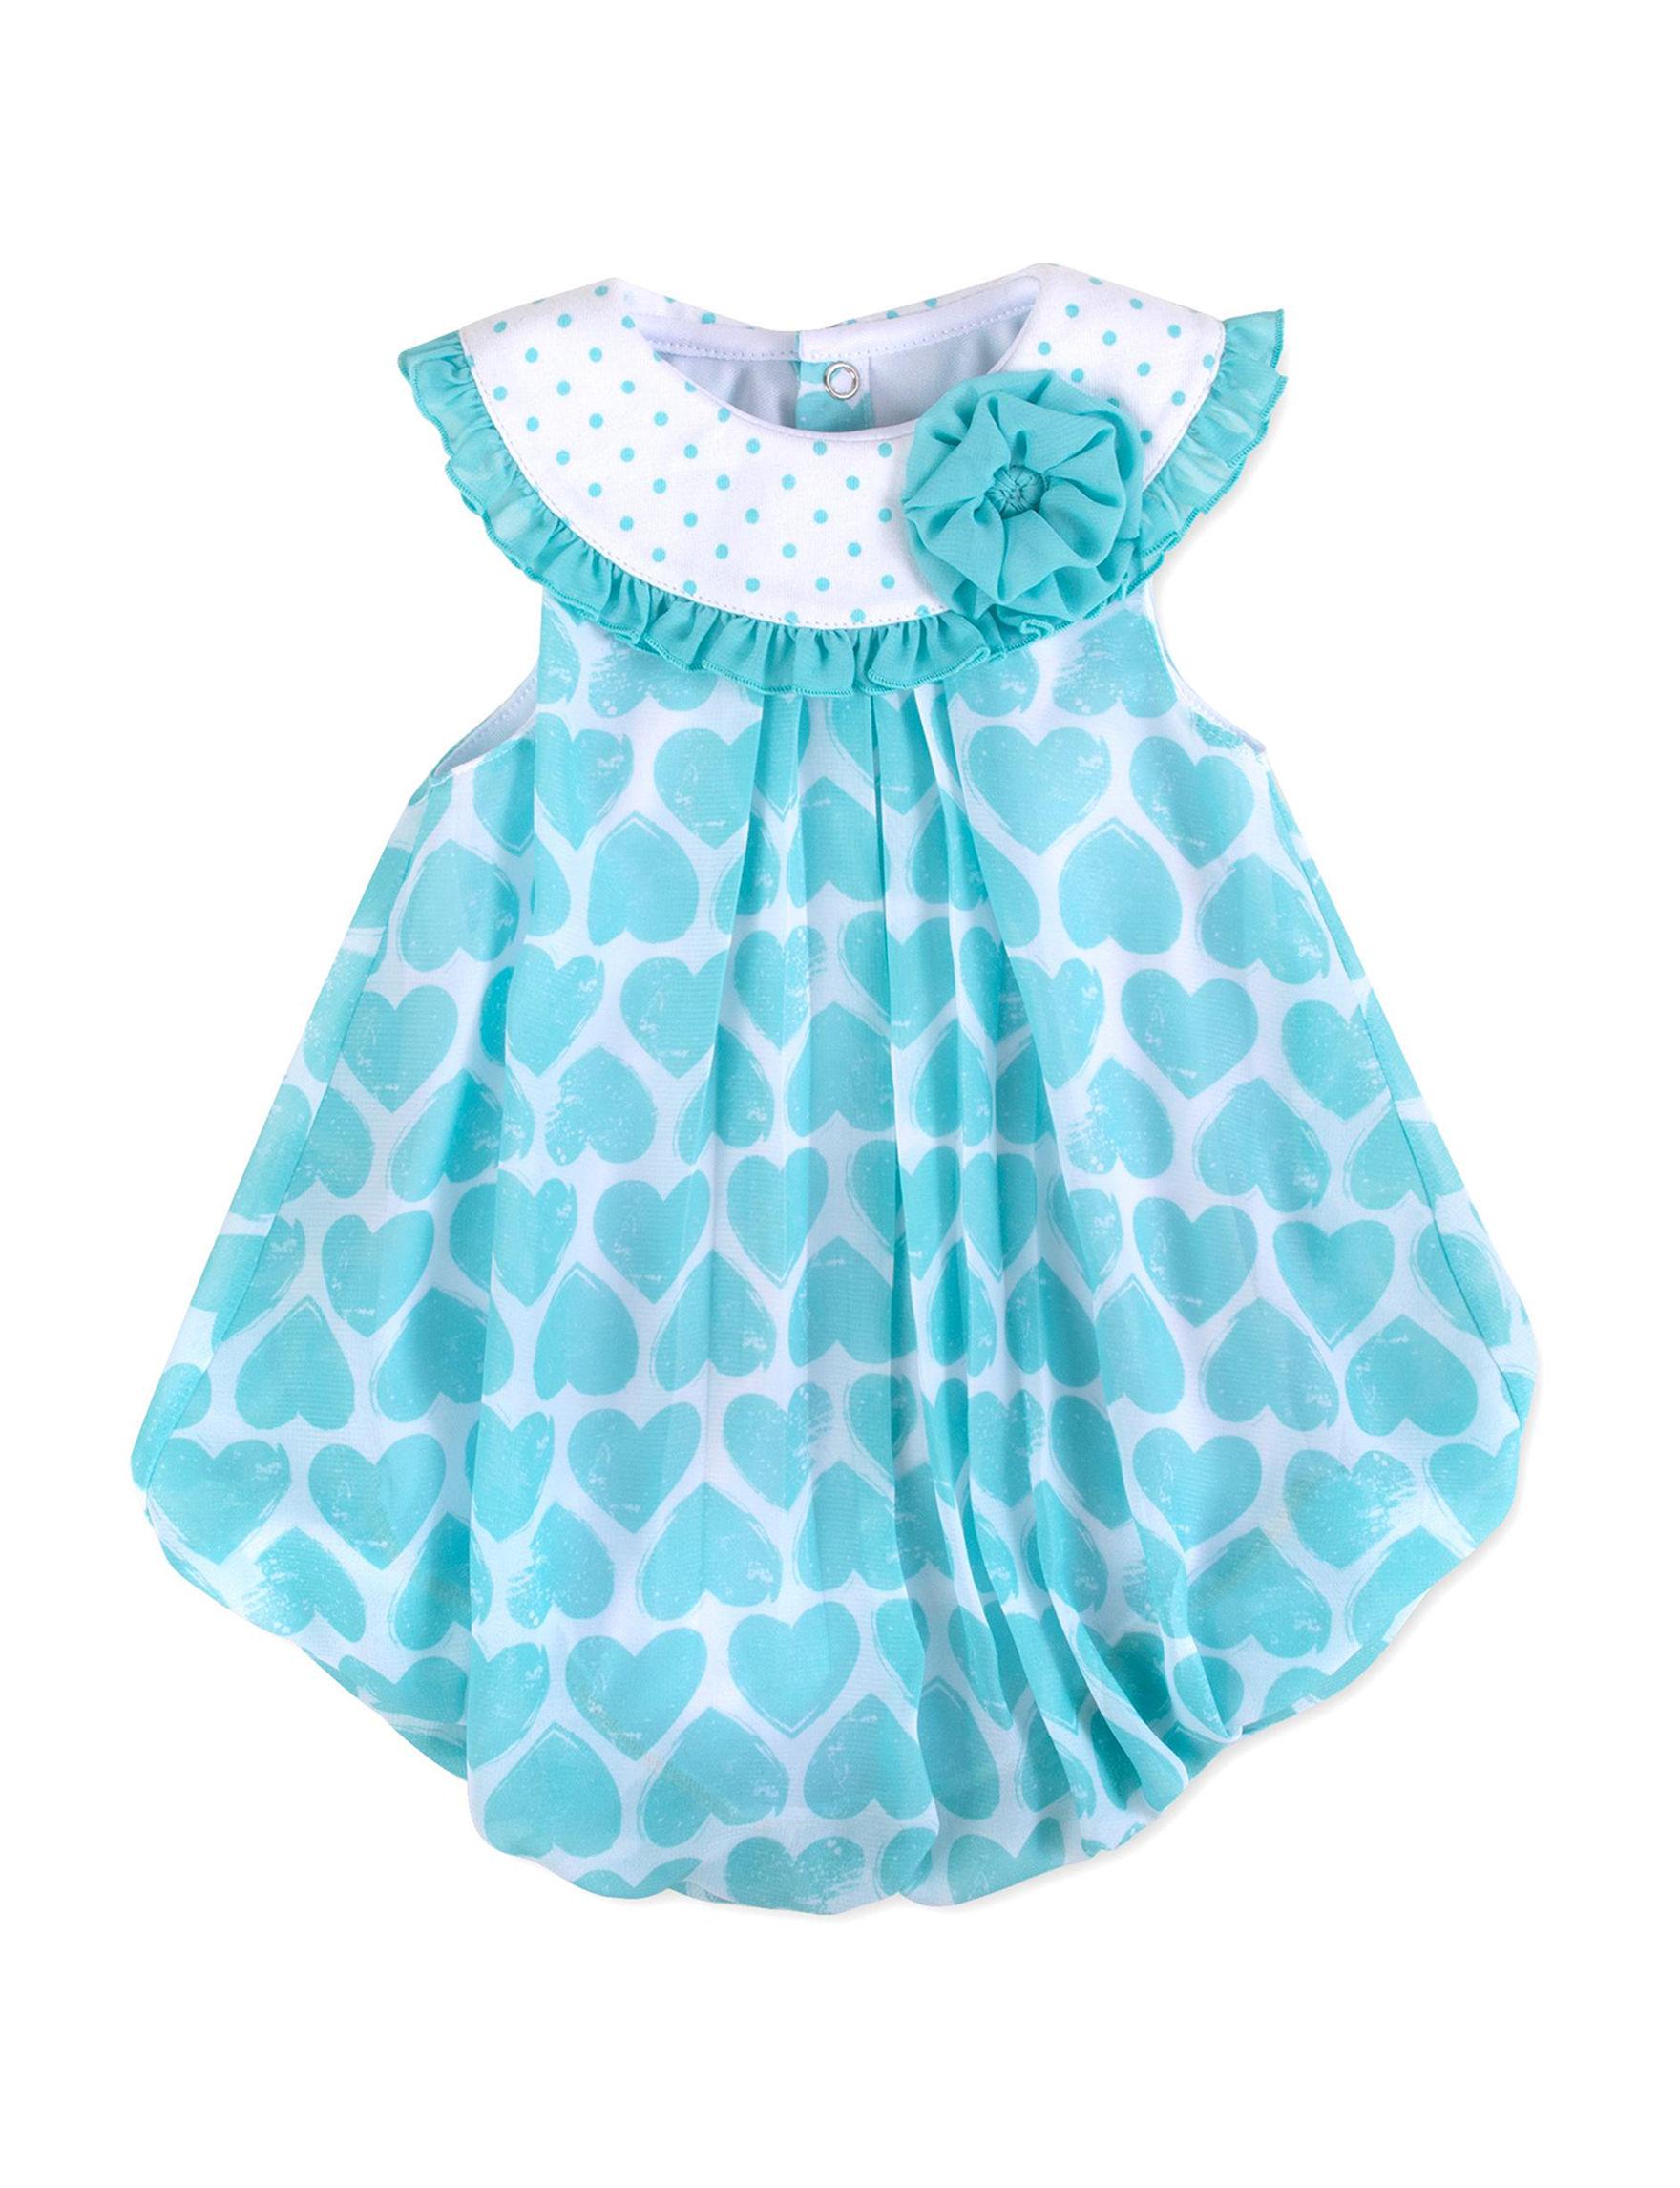 Baby Essentials Aqua